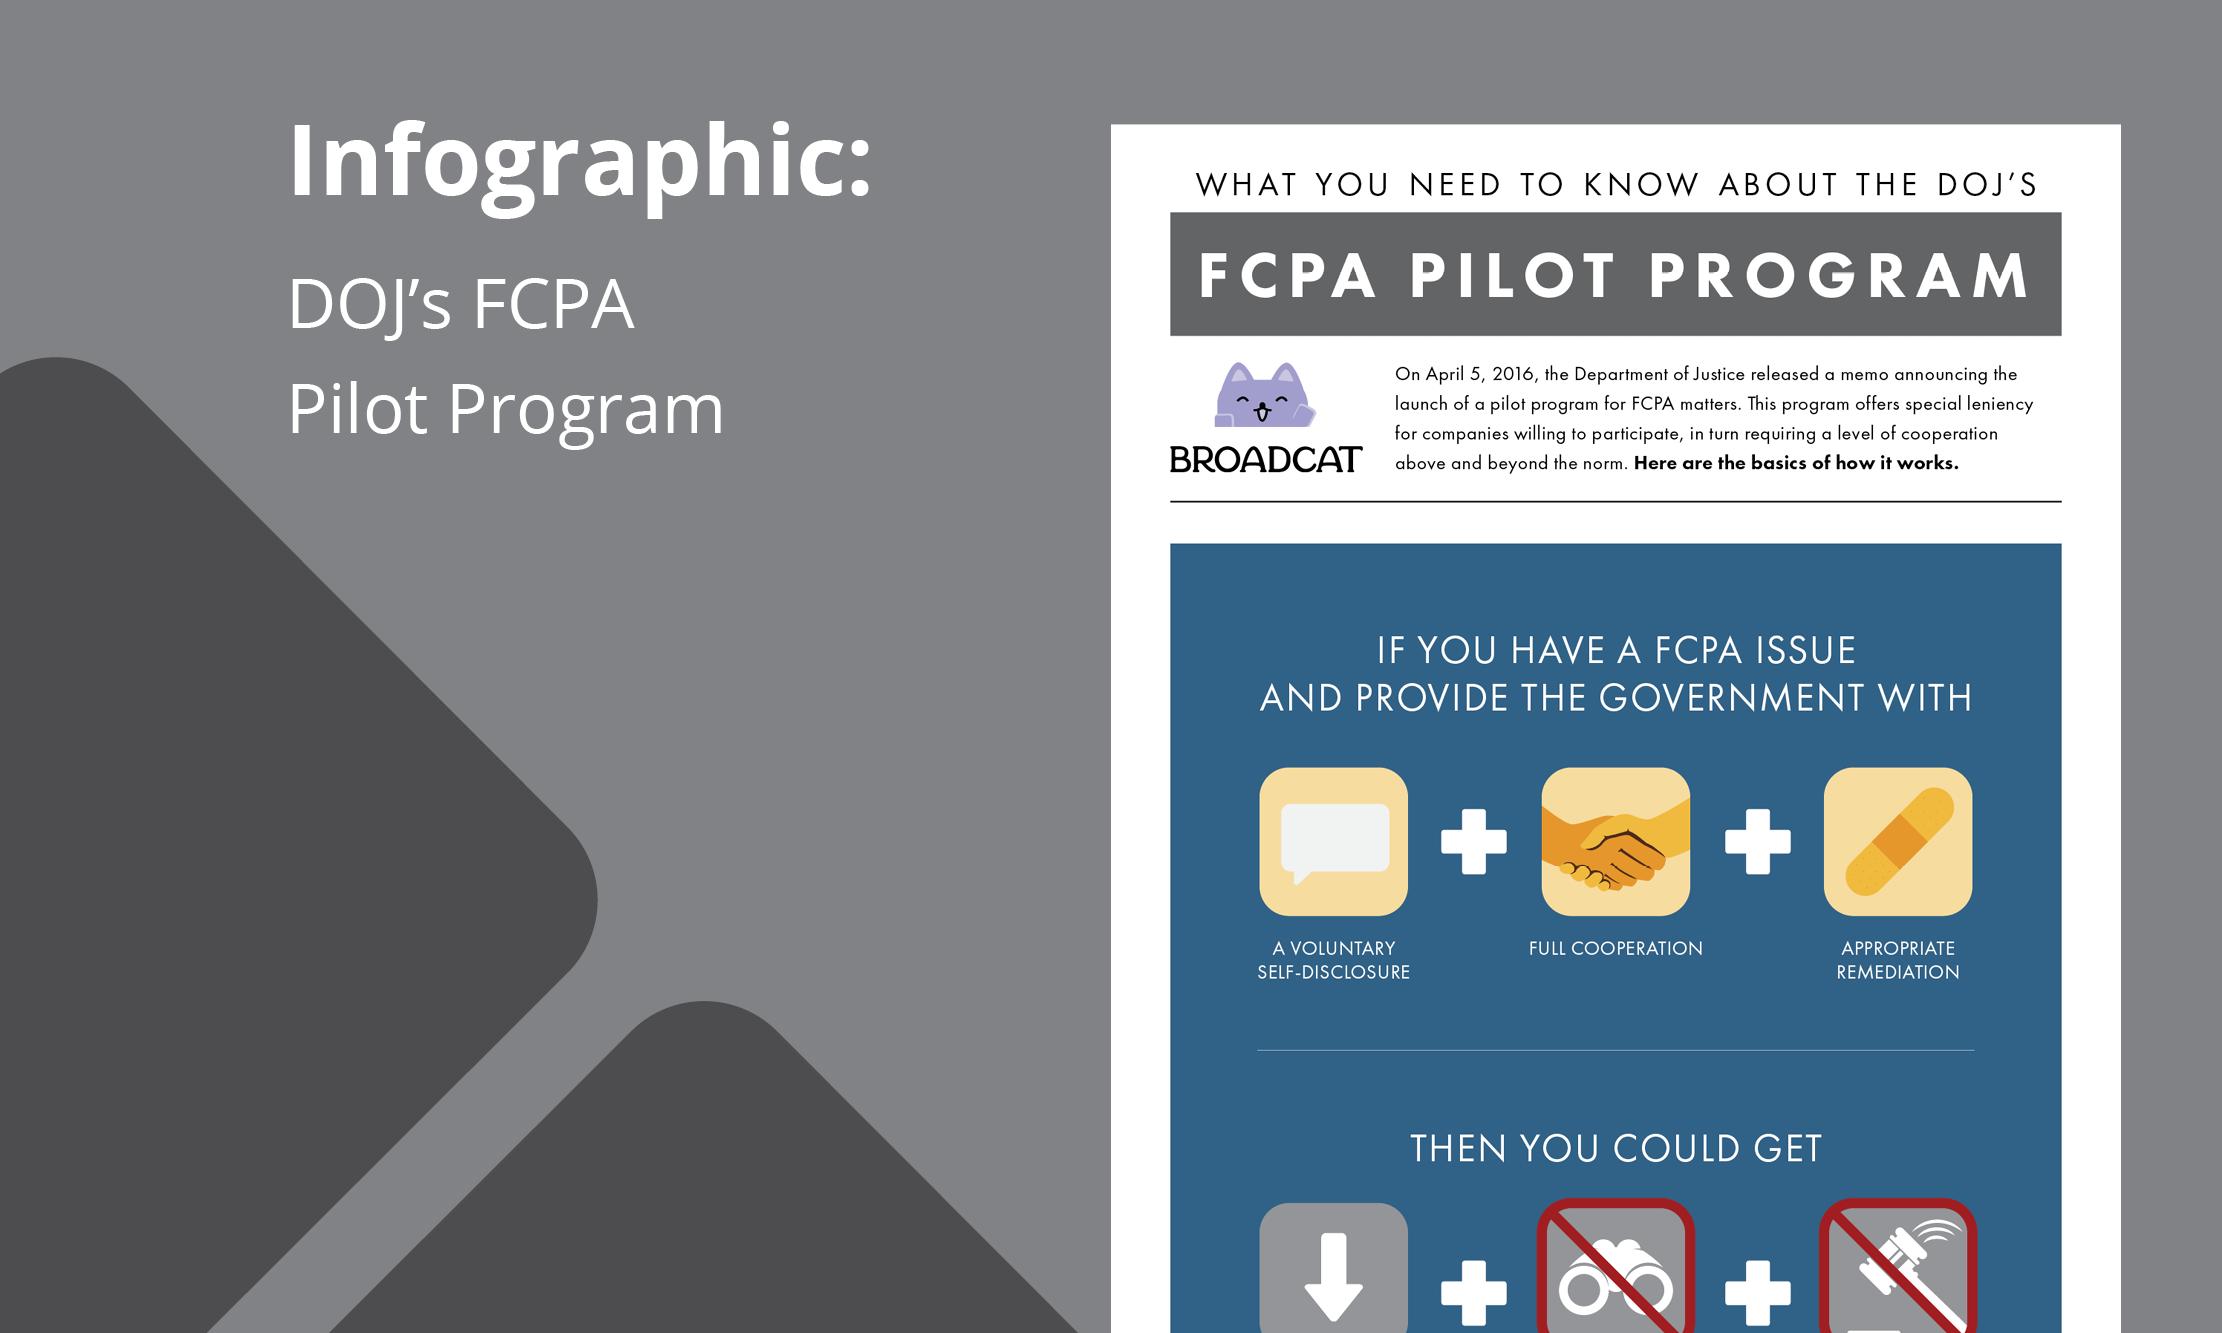 infographic-the-dojs-fcpa-pilot-program-visualized.png